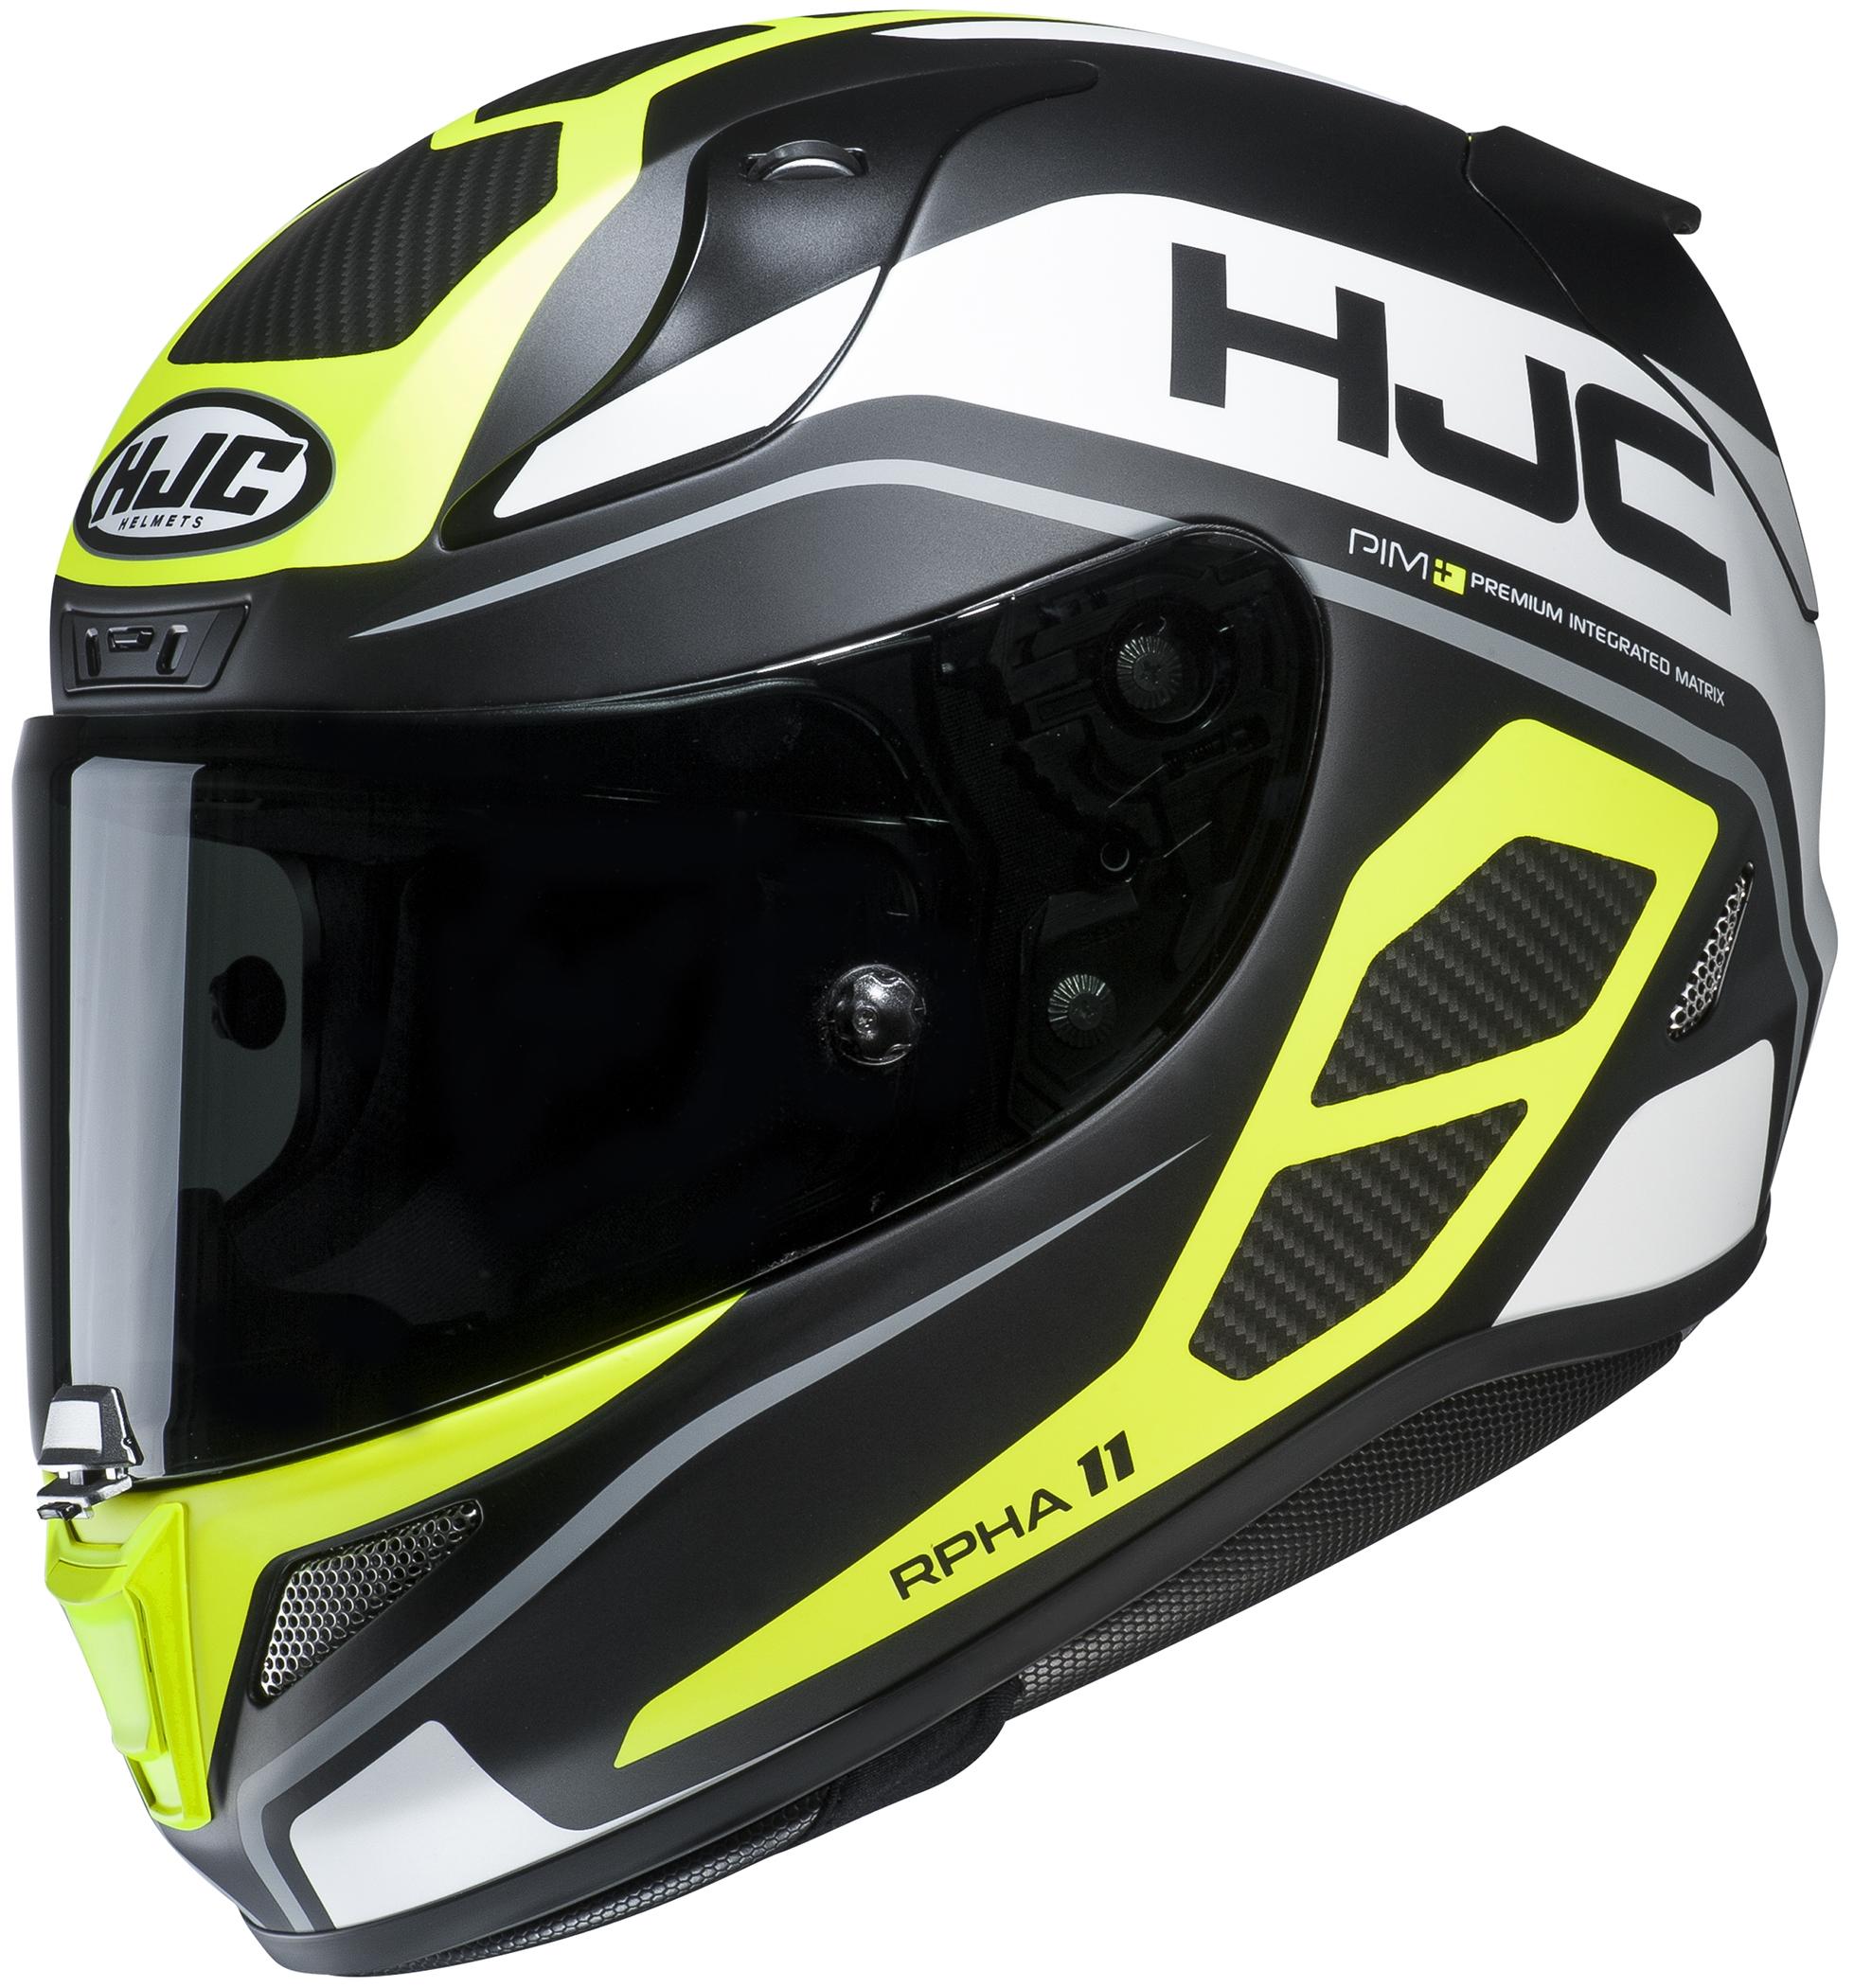 Hjc Rpha 11 >> Hjc Rpha 11 Pro Saravo Mc 4hsf Helmet